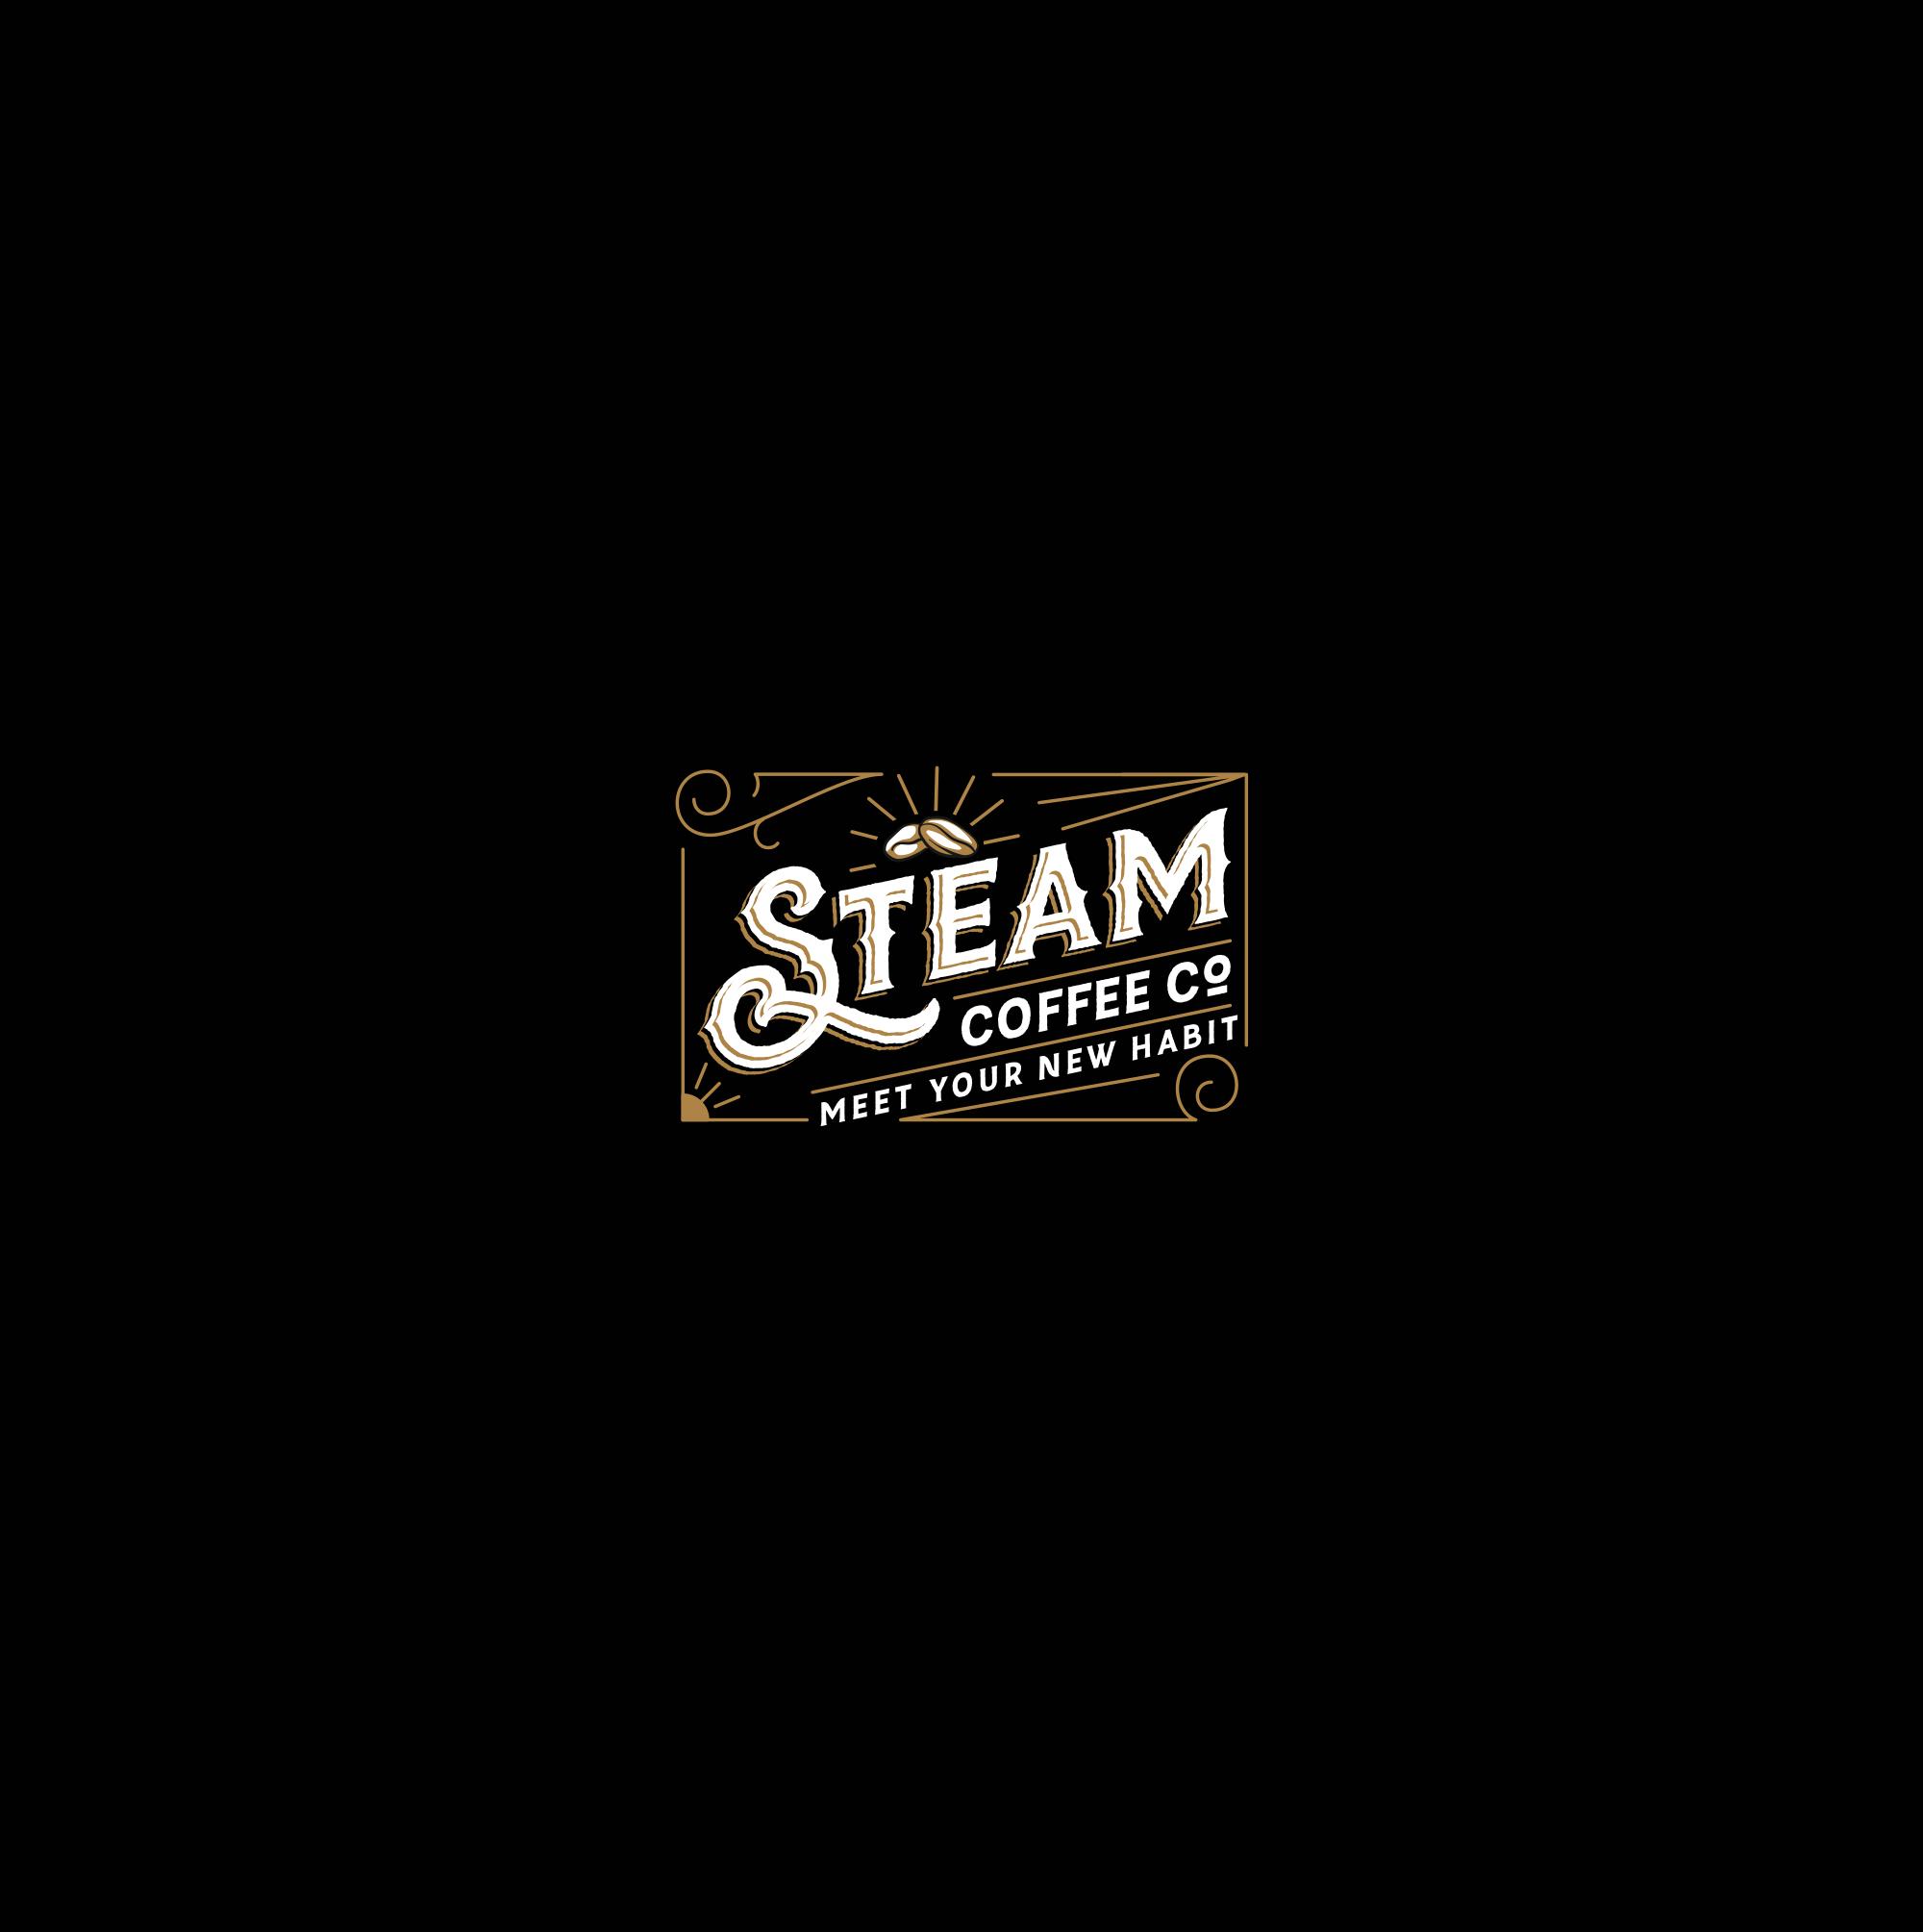 'Meet your new habit'  --- STEAM Coffee co.